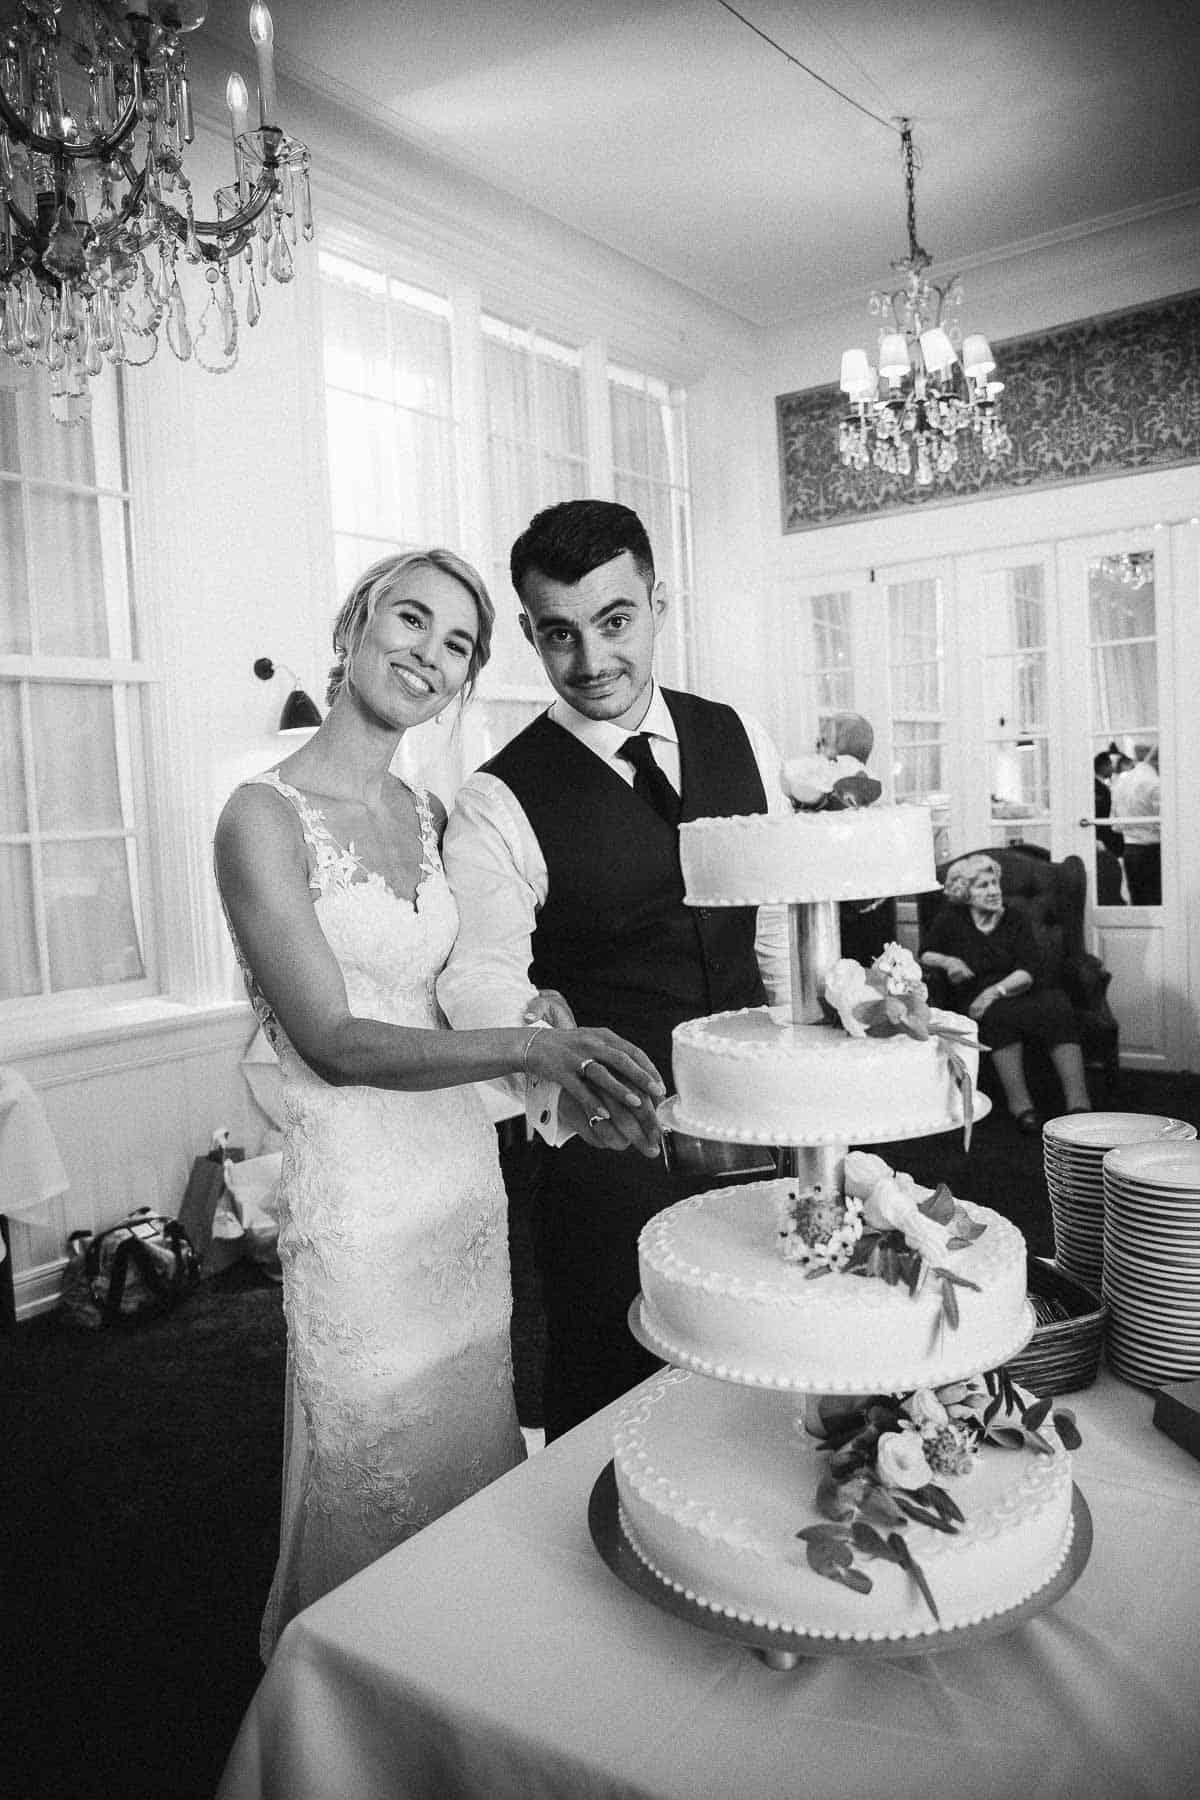 Bryllup i Frederiksberg Have - Professionel bryllupsfotograf